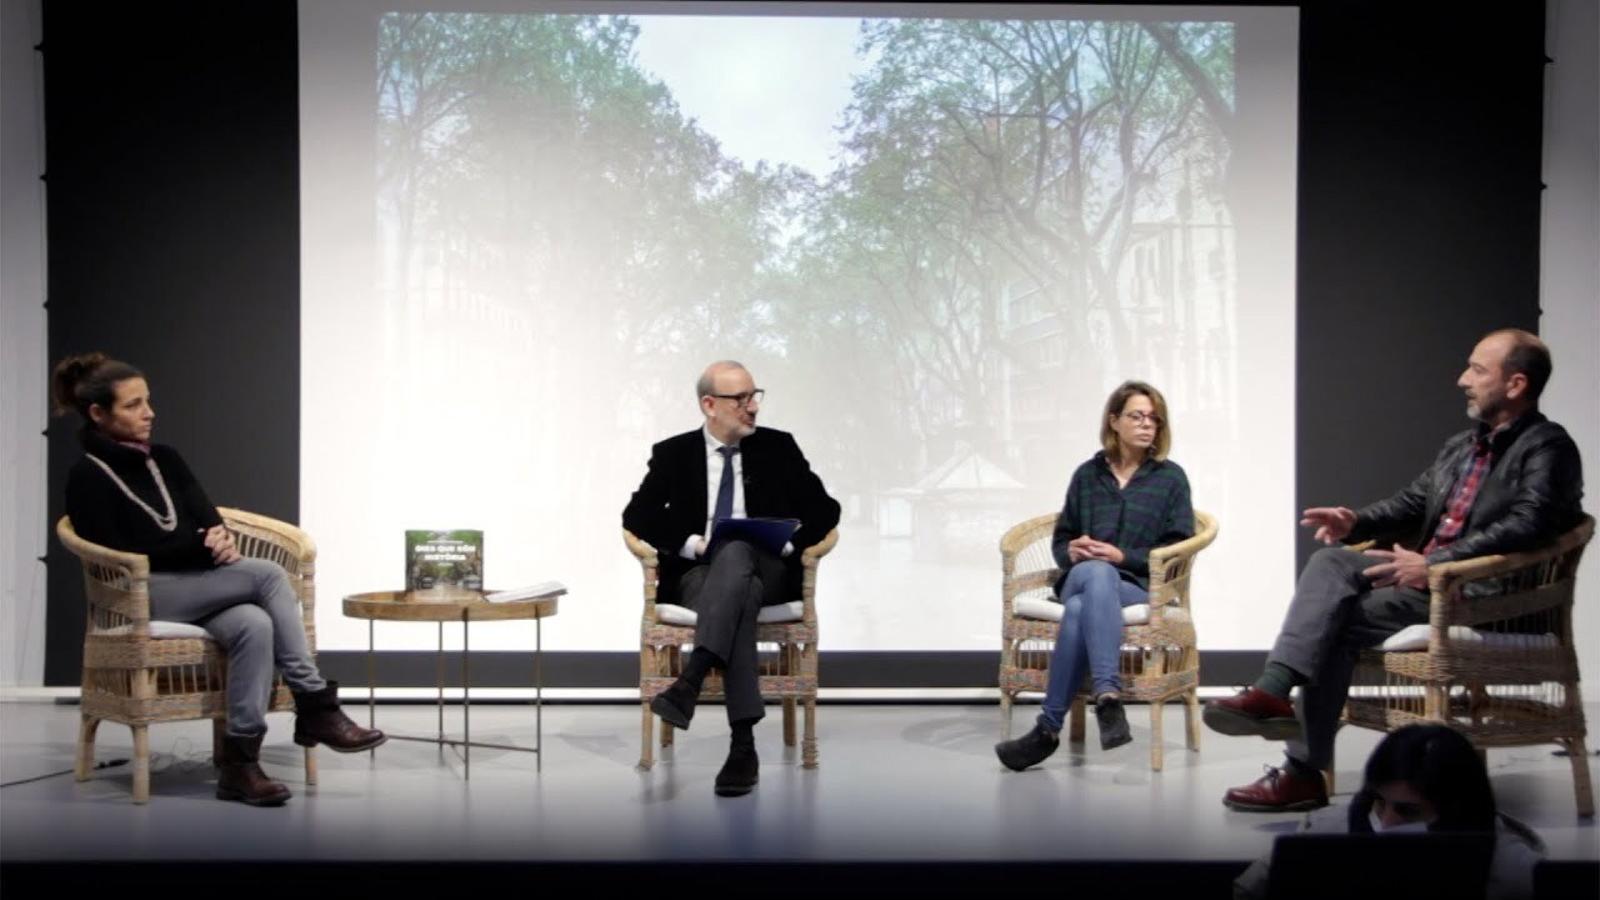 Entrevista d'Antoni Bassas a Xavier Bertral, Cèlia Atset i Anna Surinyach